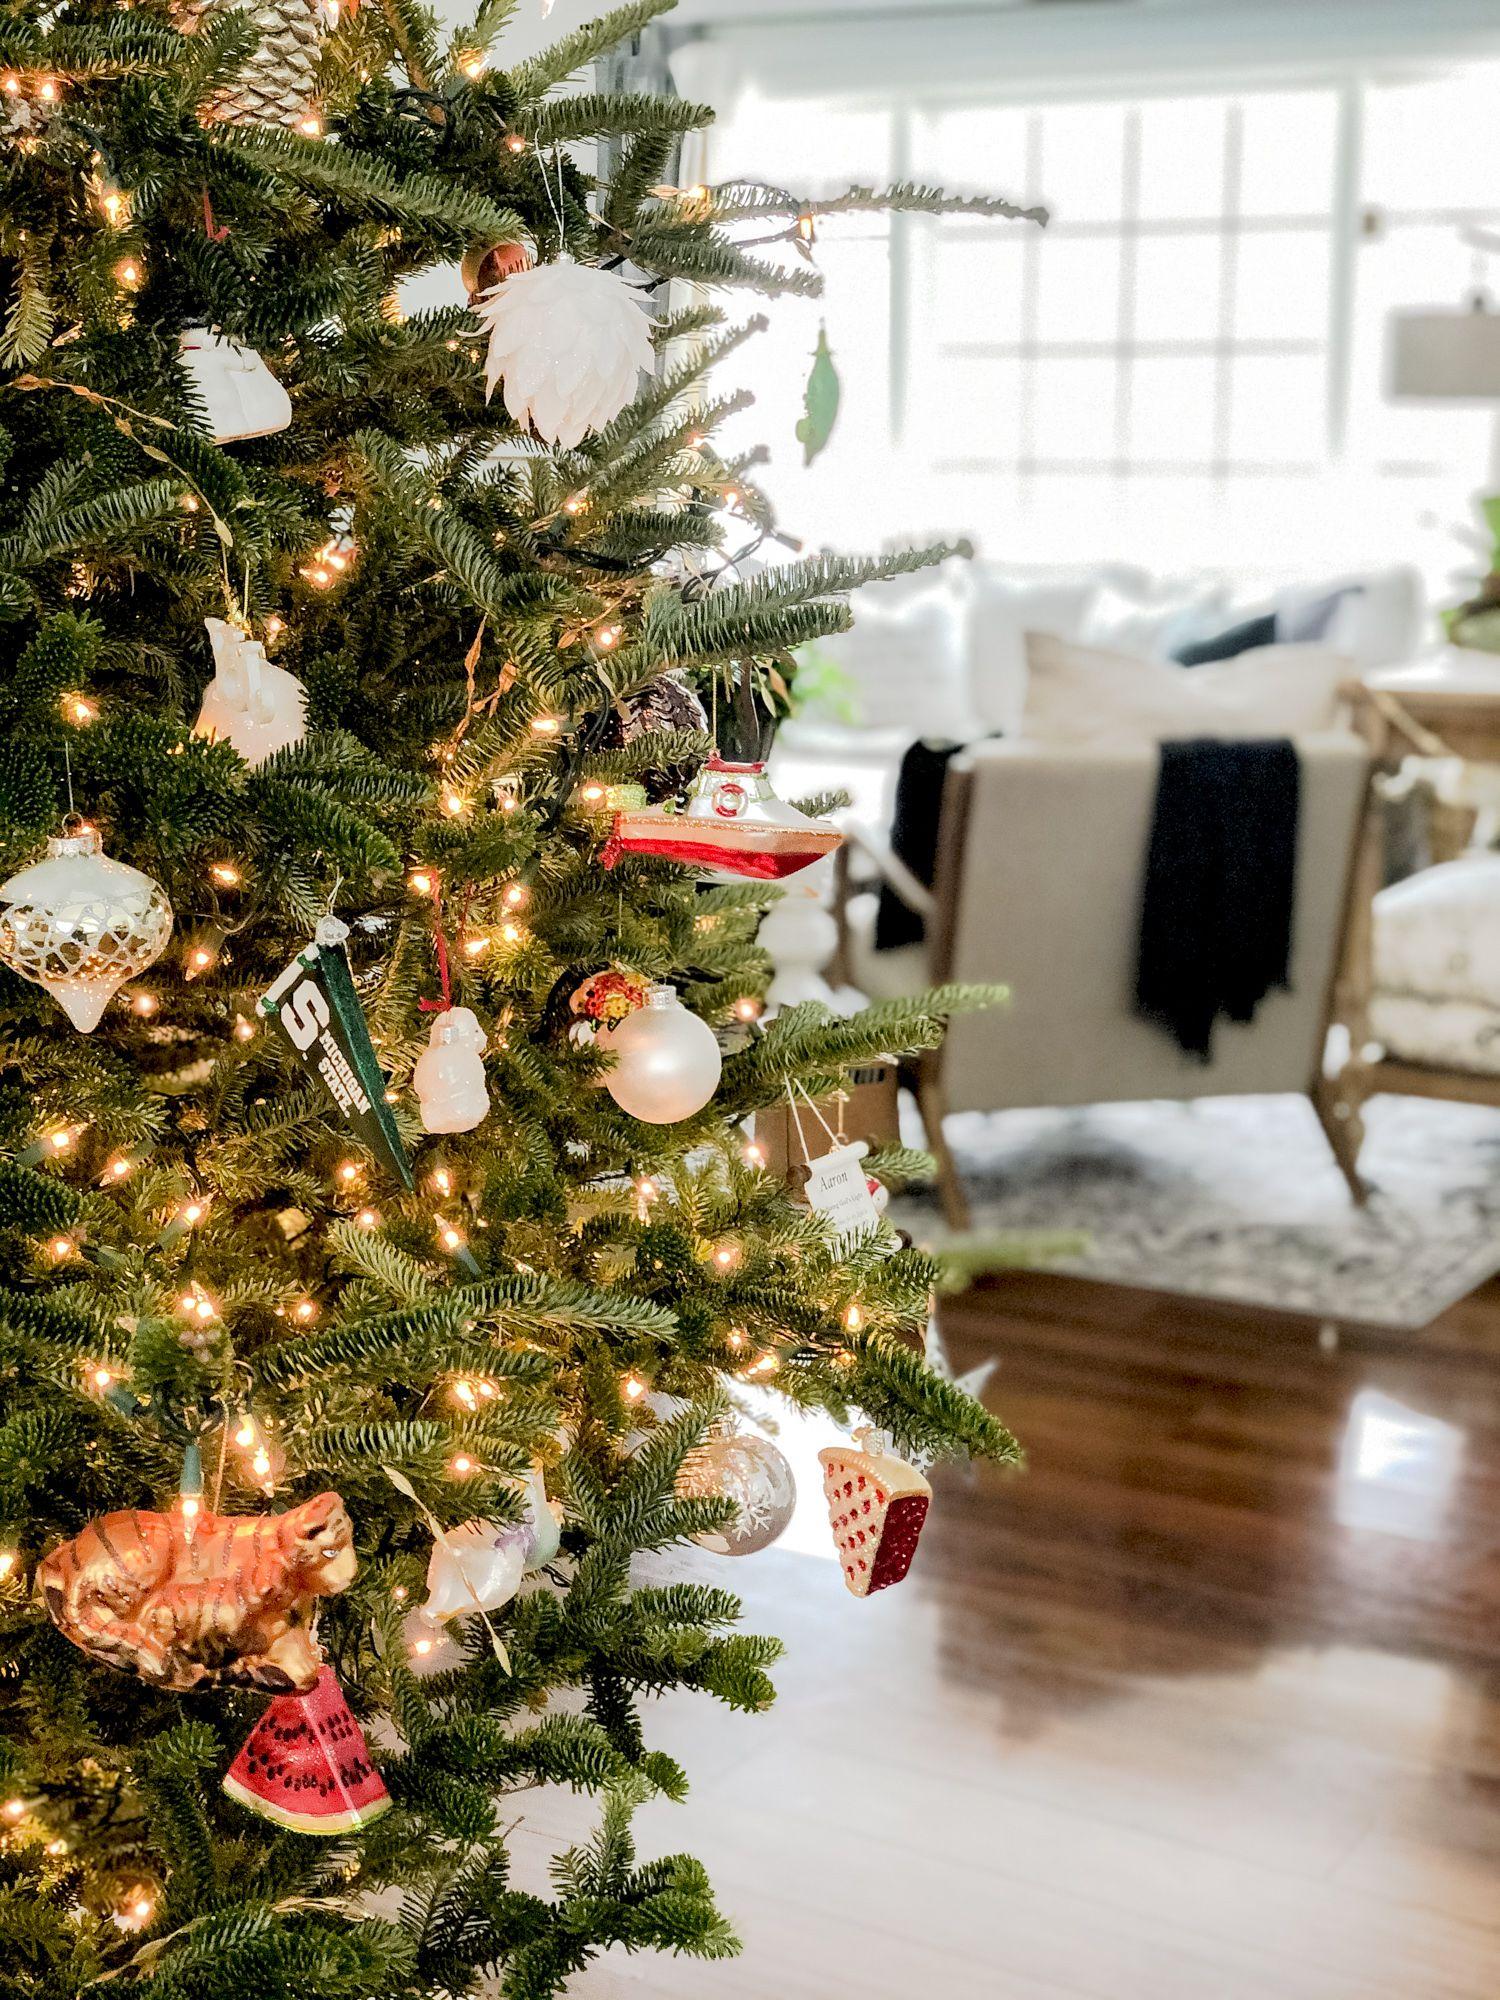 Meaningful Elegant Family Christmas Tree Decor Christmas Tree Decorations Family Christmas Ornaments Tree Decor